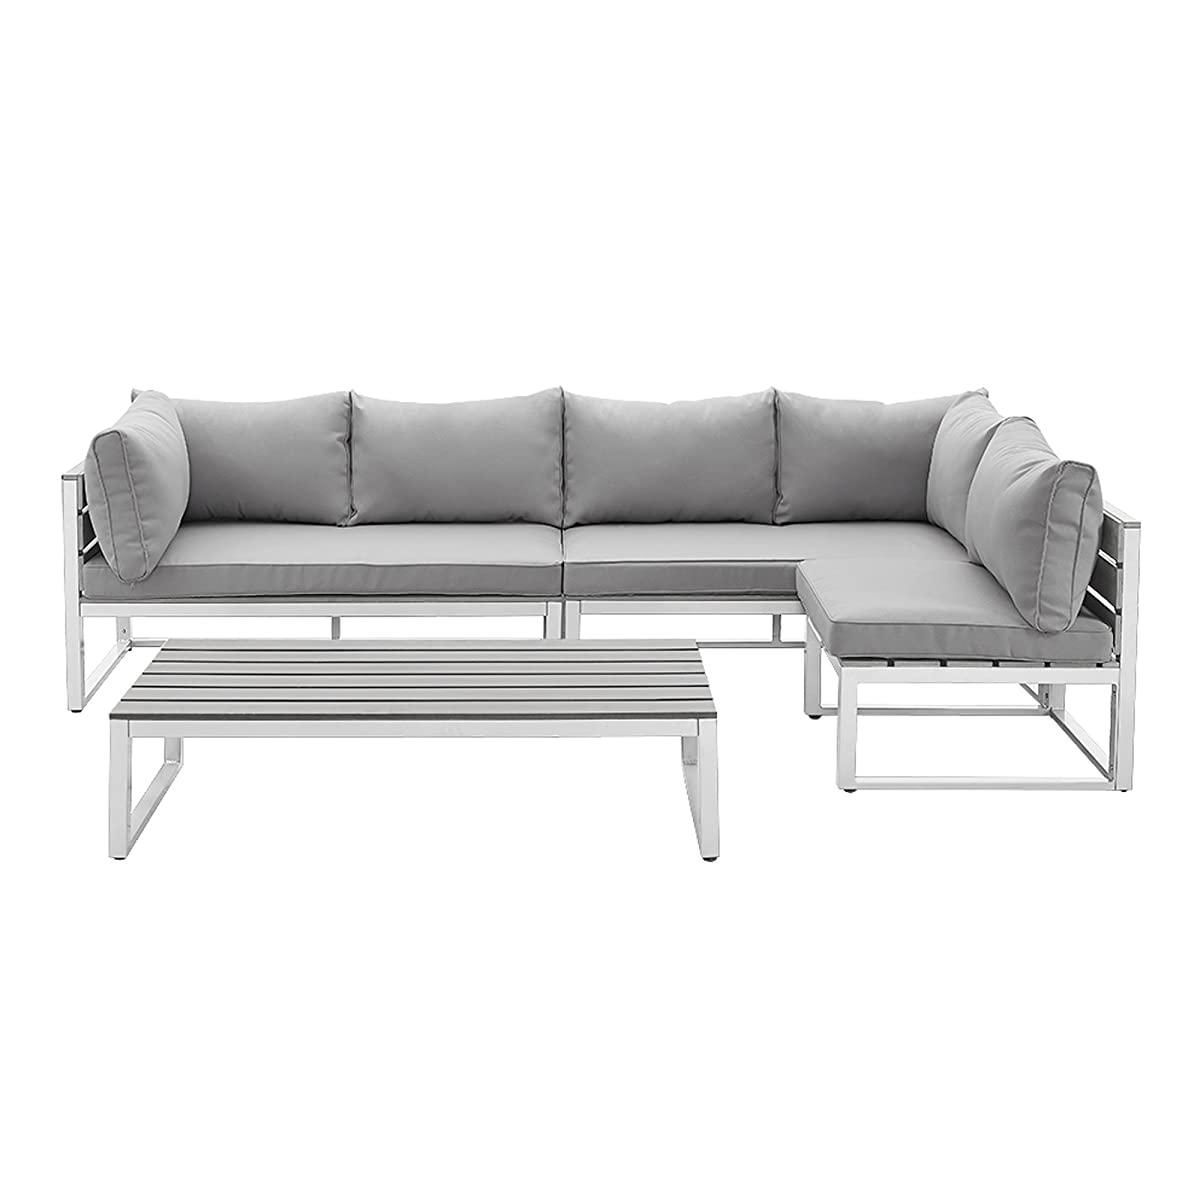 WE Furniture All-Weather 4 Piece Patio Conversation Set, Grey